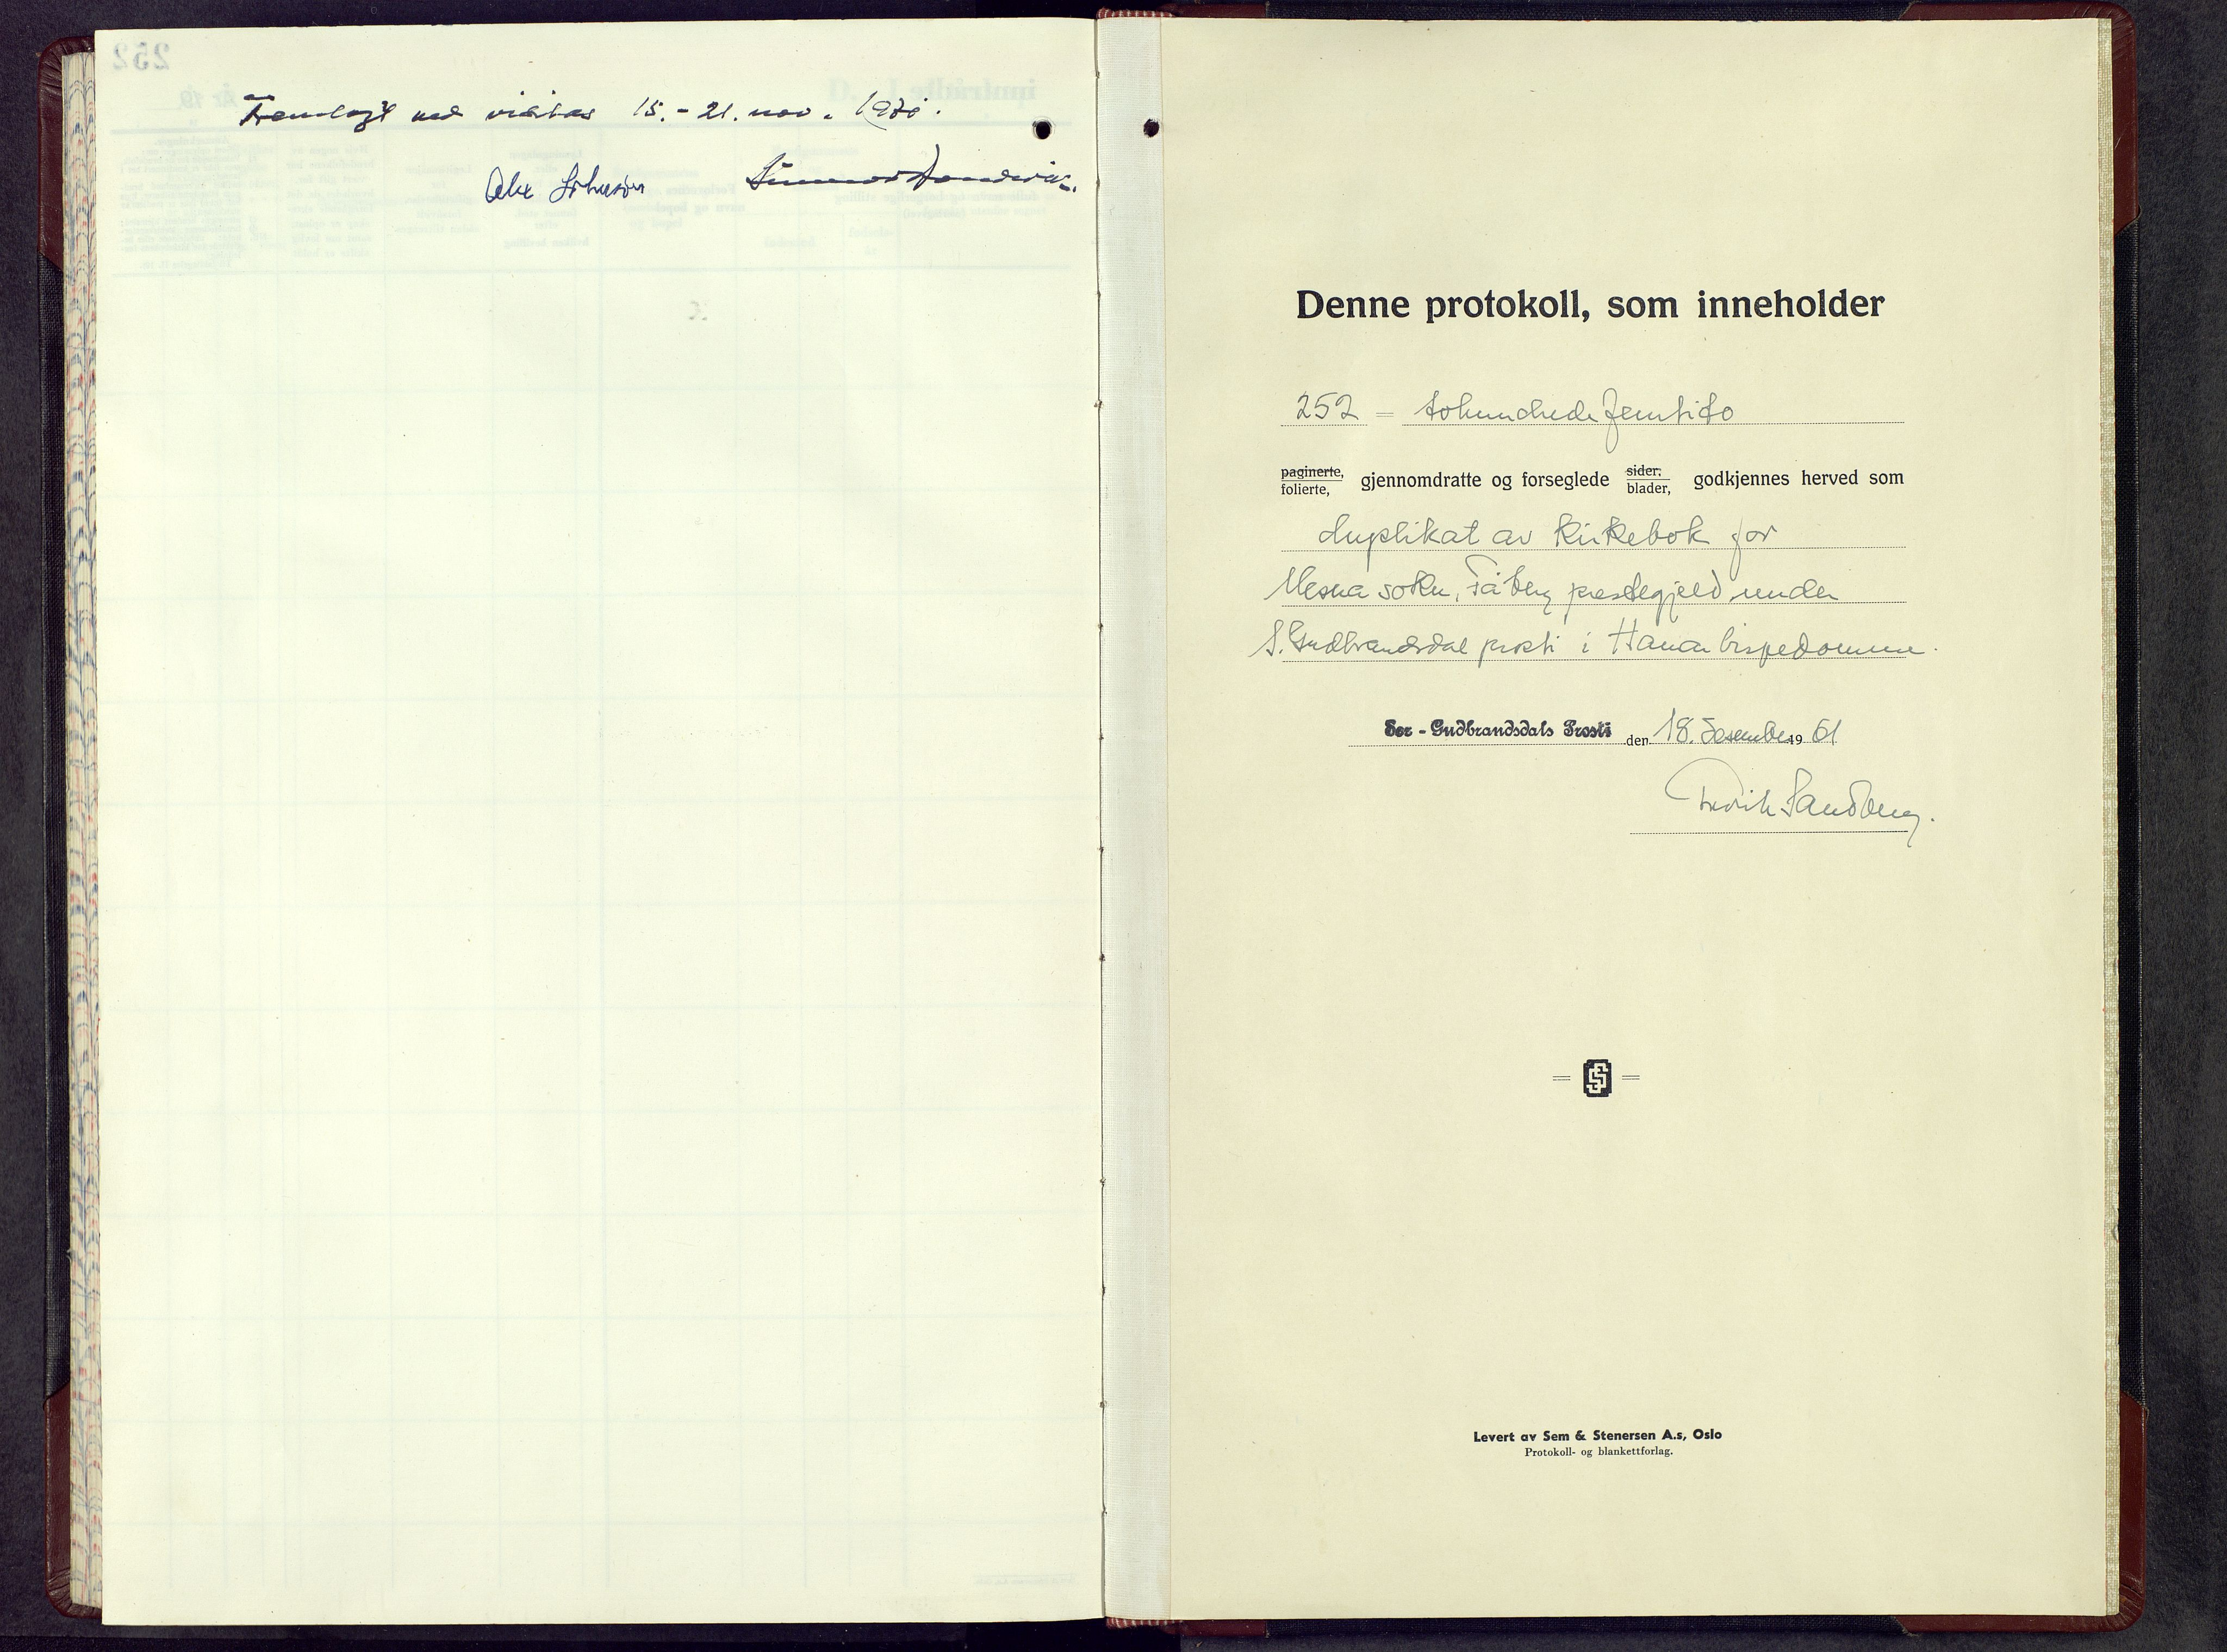 SAH, Fåberg prestekontor, H/Ha/Hab/L0020: Parish register (copy) no. 20, 1961-1968